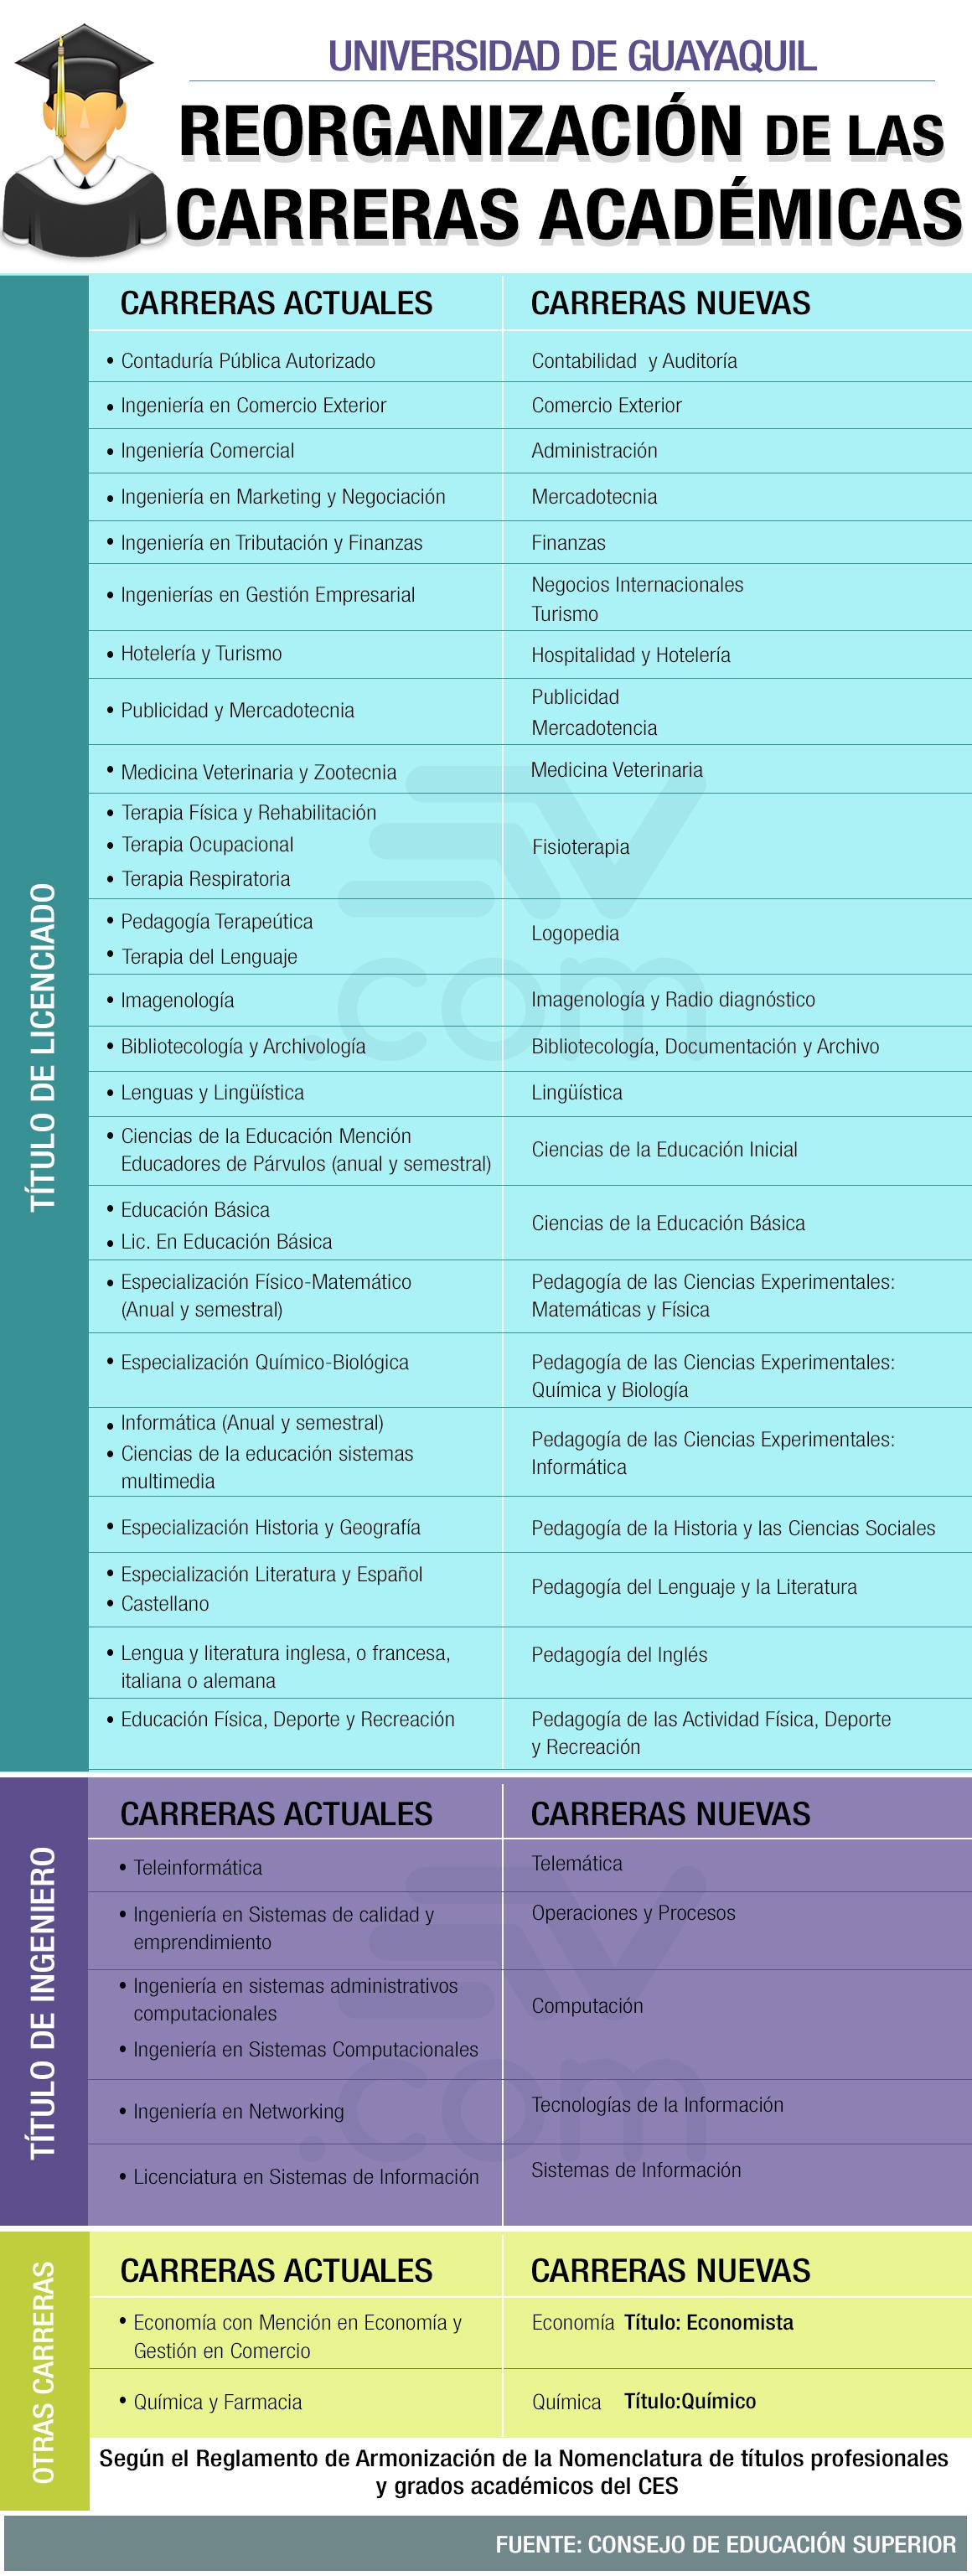 Lista de Carreras de la Universidad de Guayaquil